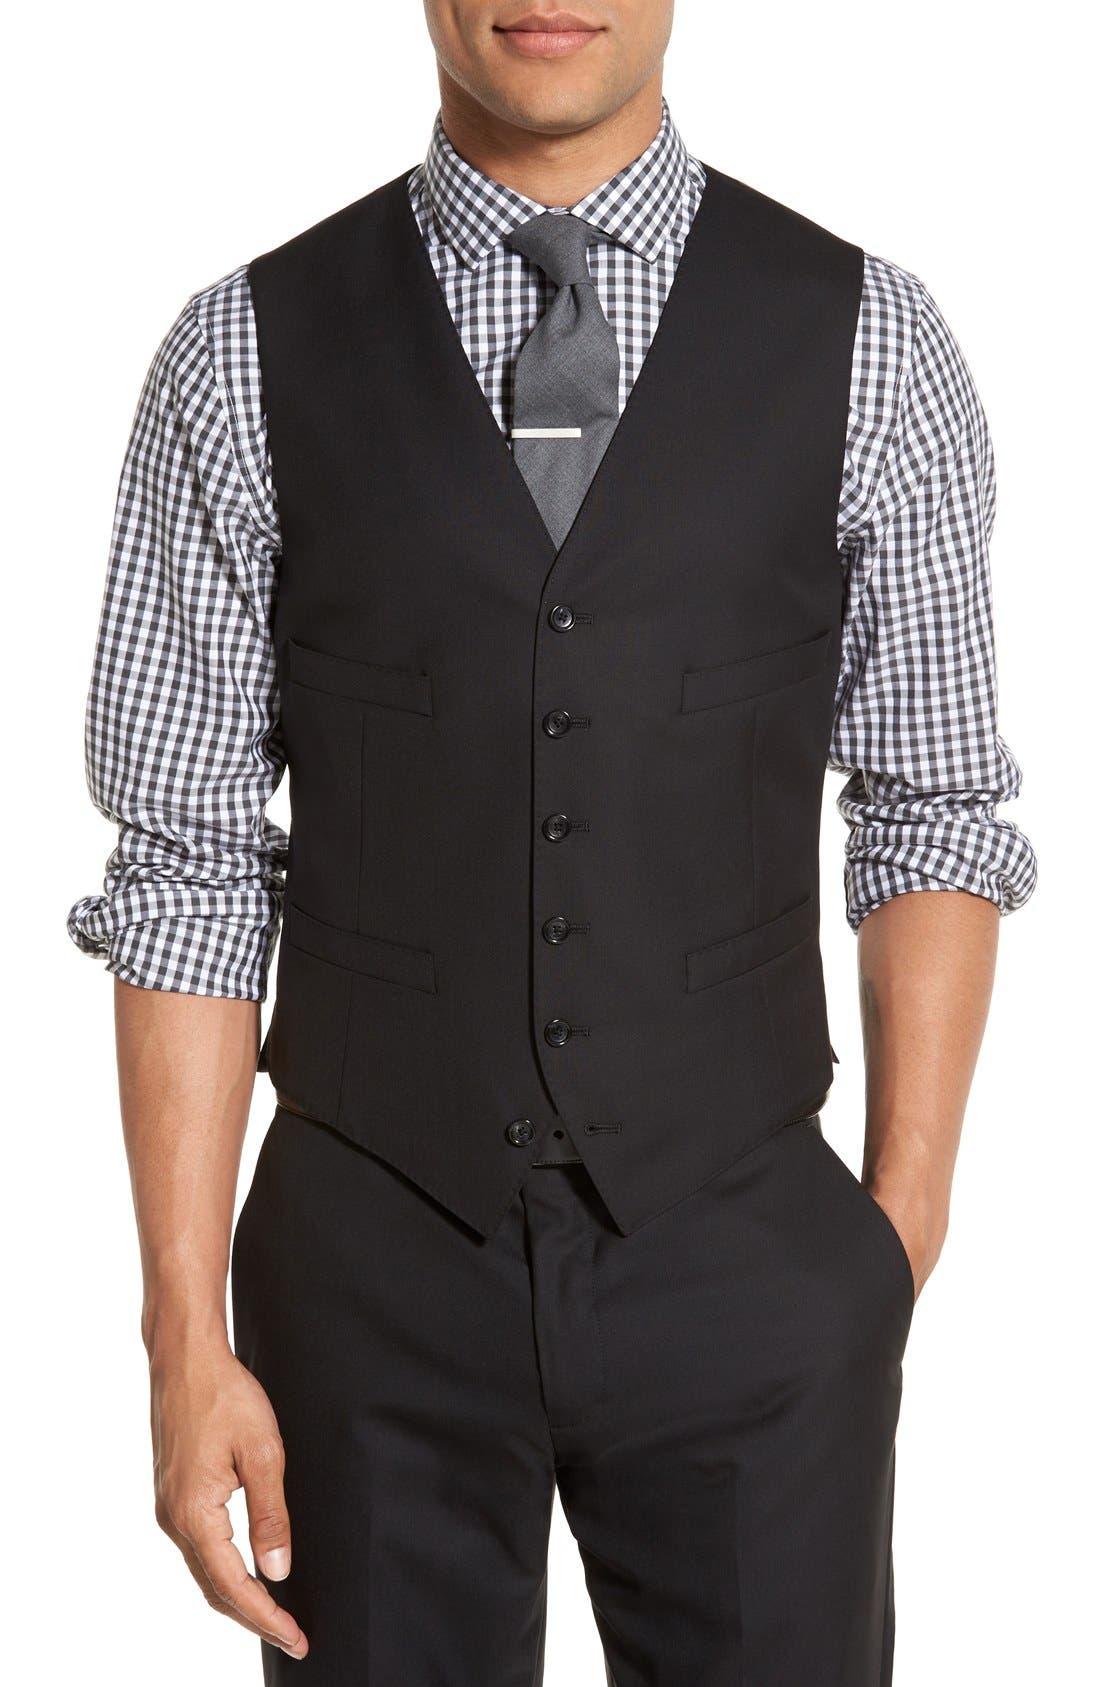 J.Crew Ludlow Trim Fit Solid Wool Vest